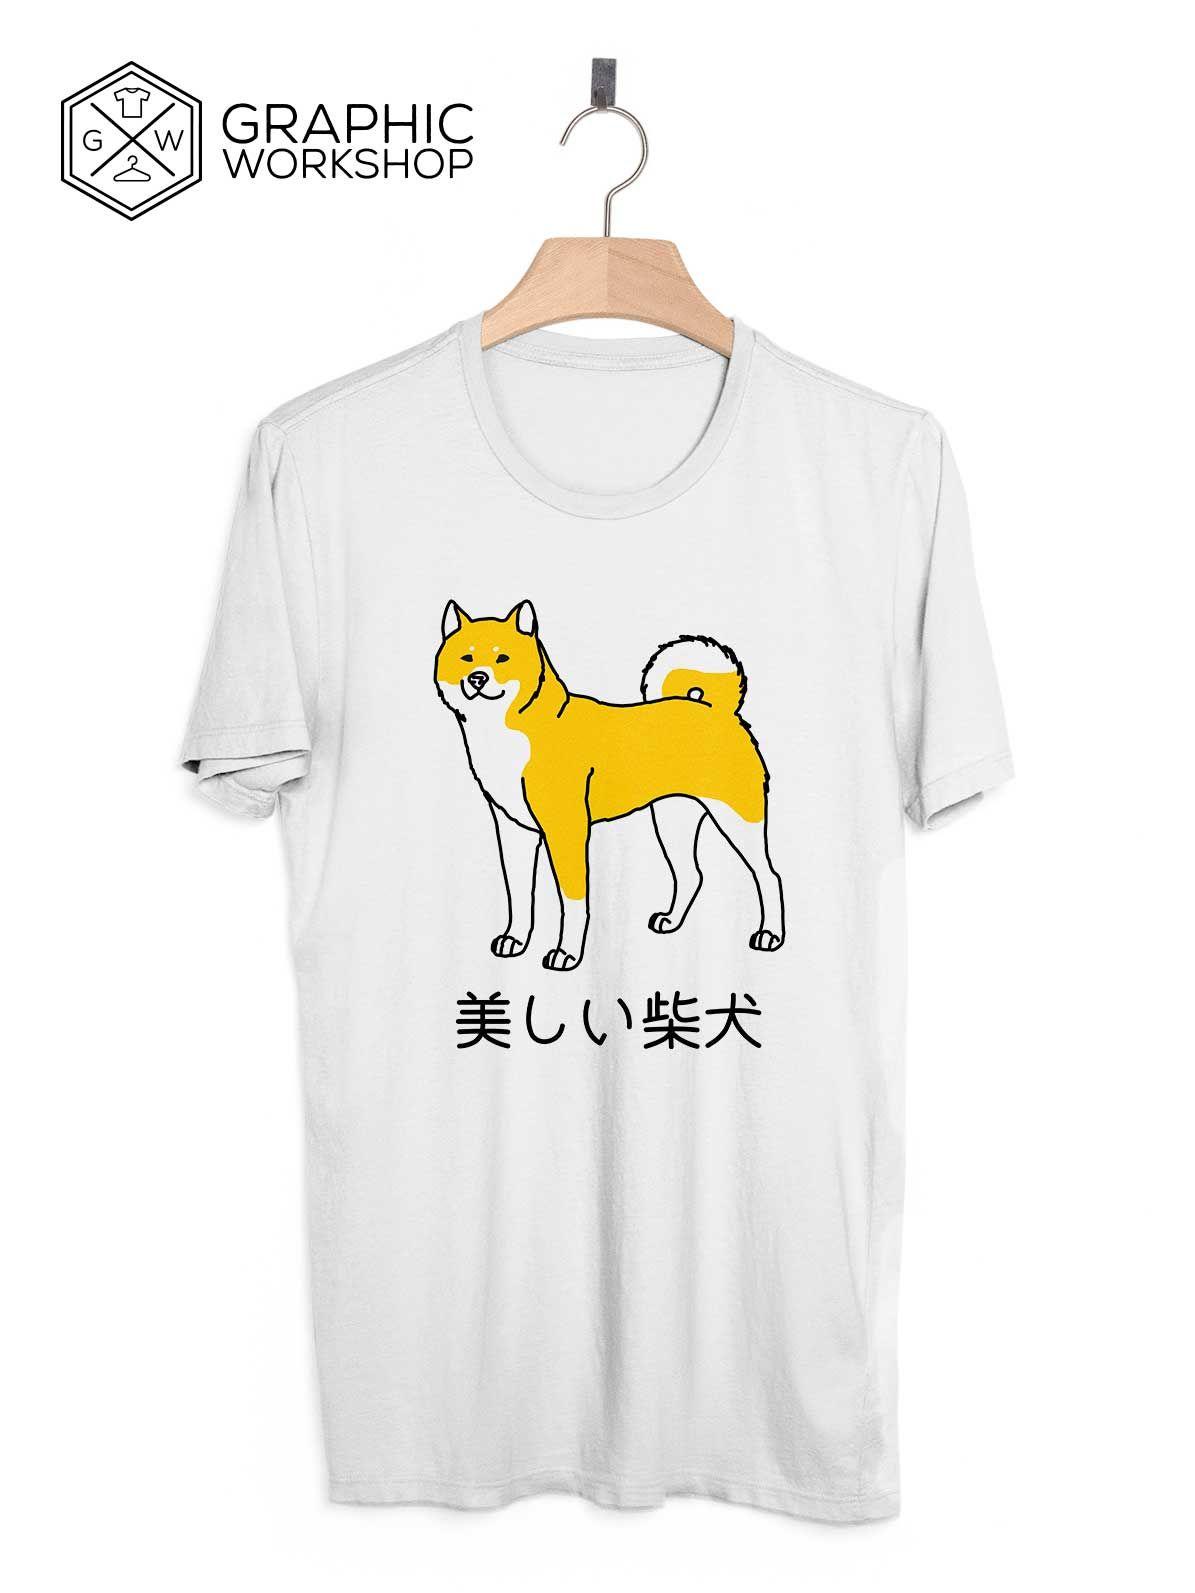 a1a4bef40 Shibe Doge T-Shirt // Japanese Clothing Shiba Inu Tumblr Vaporwave  Aesthetics…